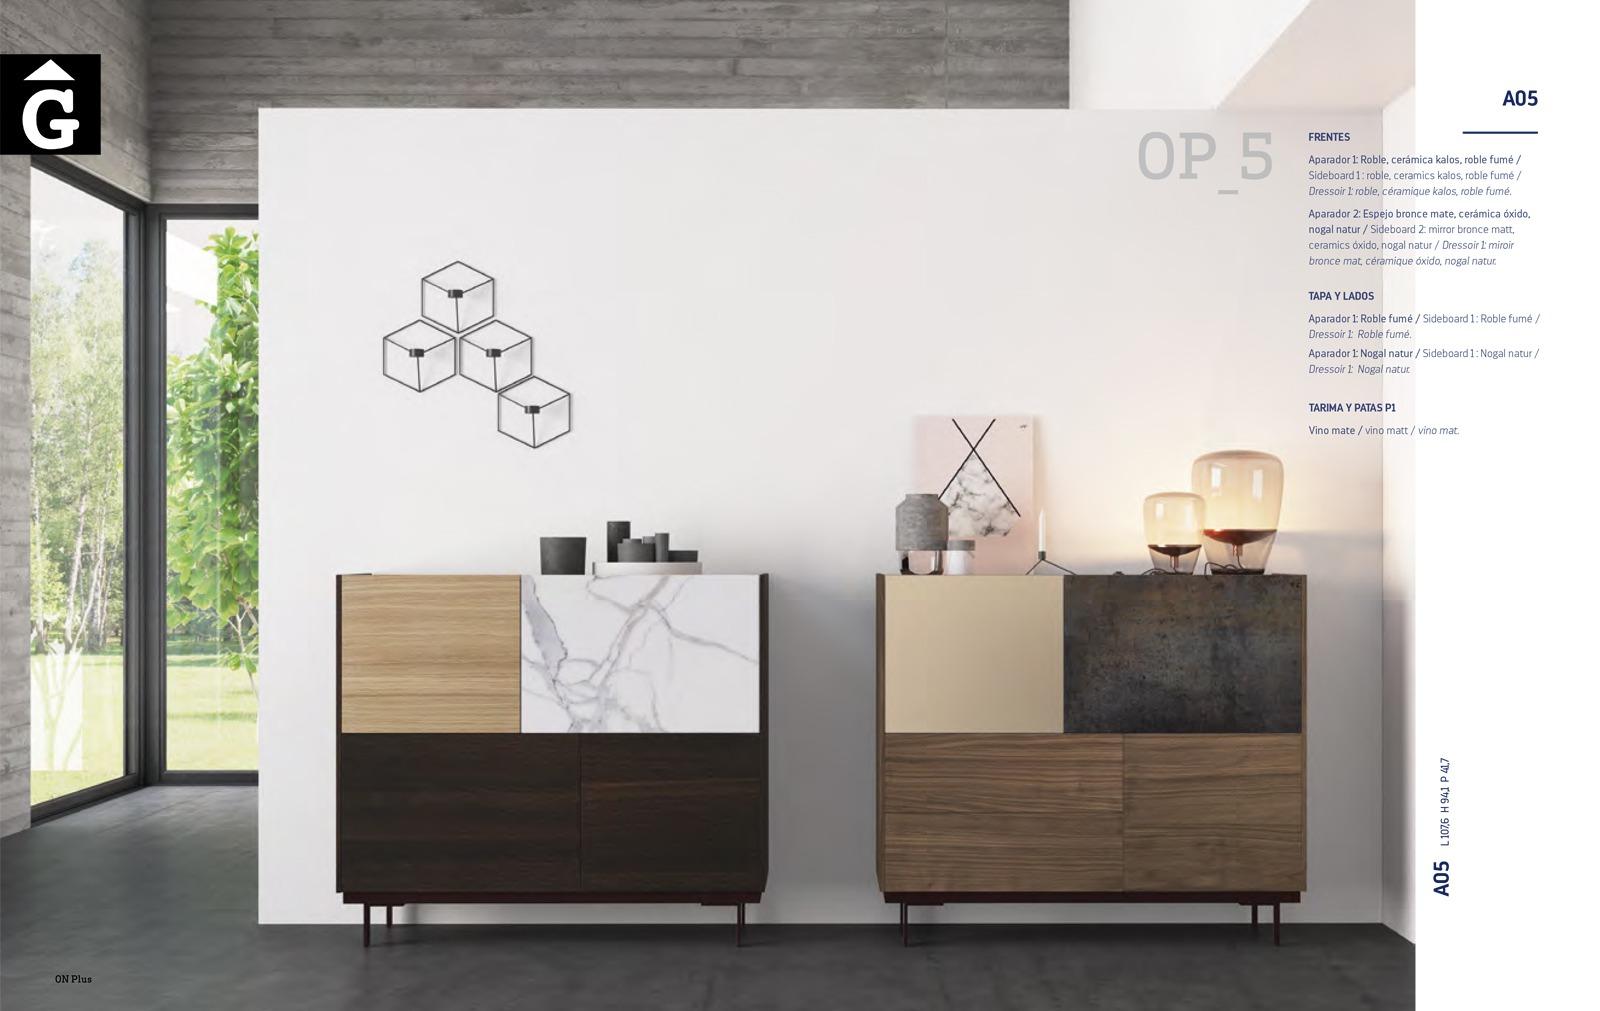 On Plus mobles bufet alt Aparadors Twins ViVe muebles Verge programa mobles menjador rebedor living by mobles Gifreu